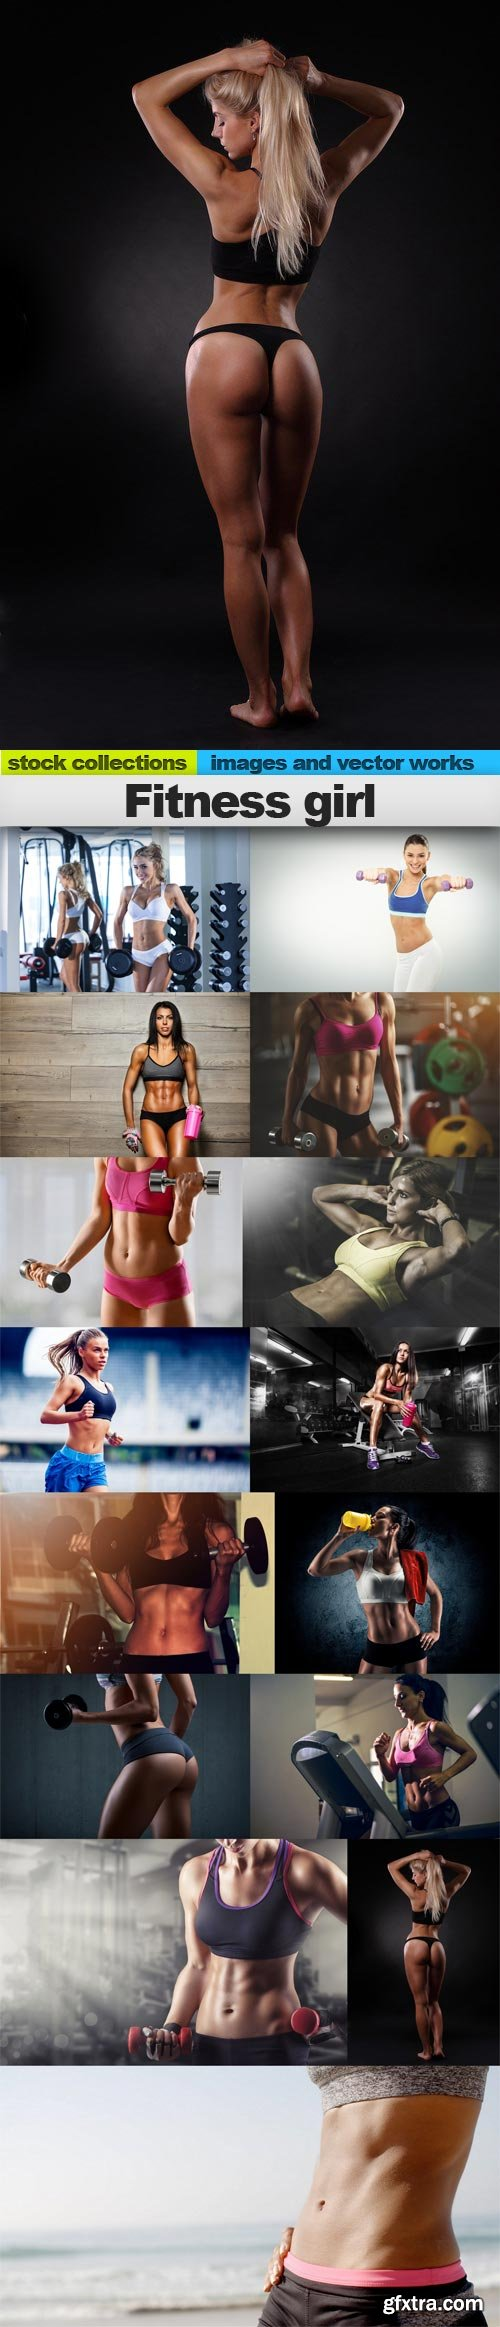 Fitness girl, 15 x UHQ JPEG